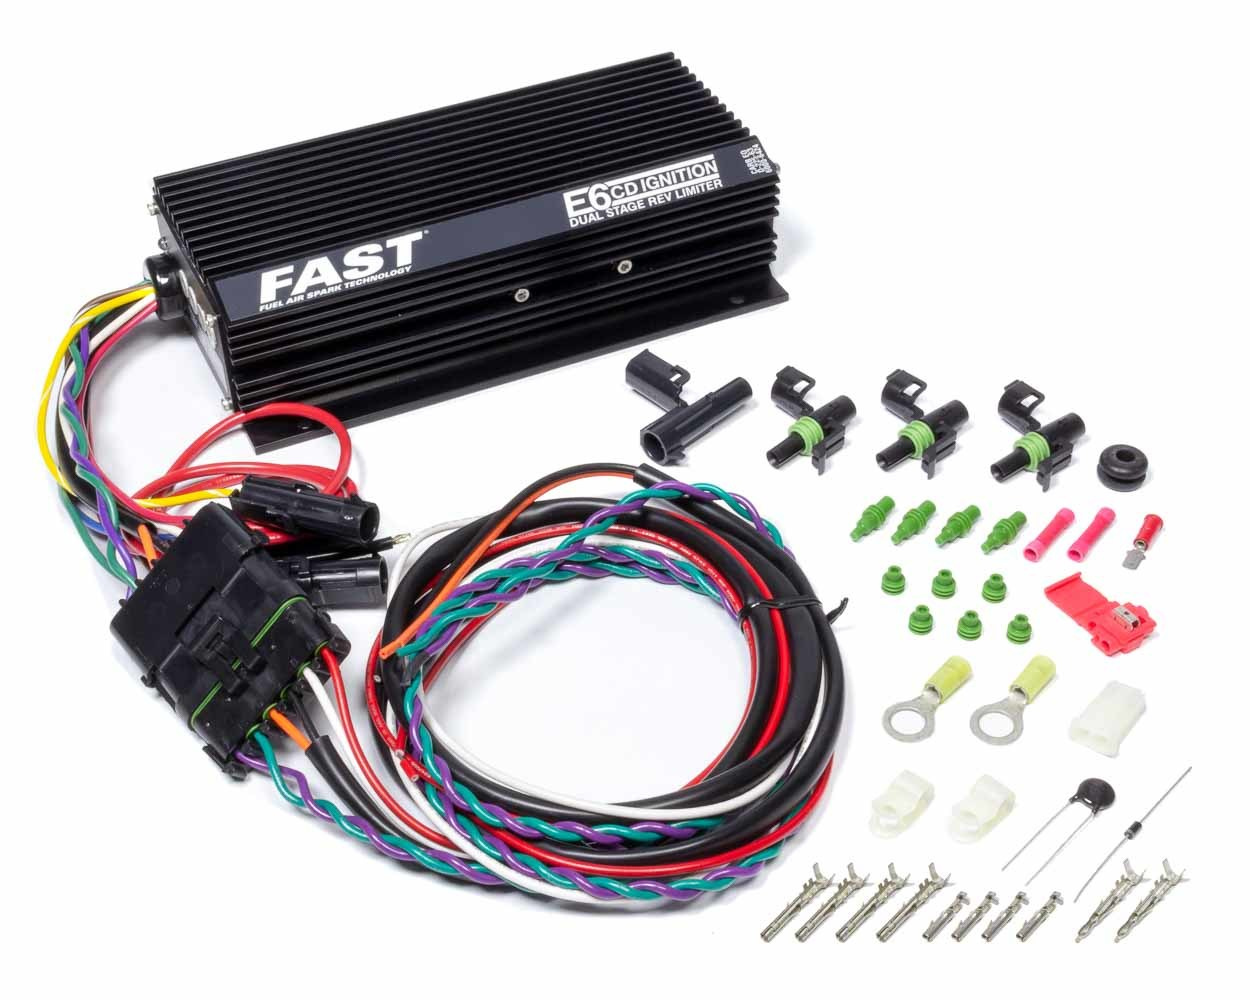 Fast Electronics 6000-6424 Ignition Box, FireBall, HI-6DSR, Digital, CD Ignition, Multi-Spark, Dual-Stage Rev Limiter, Kit